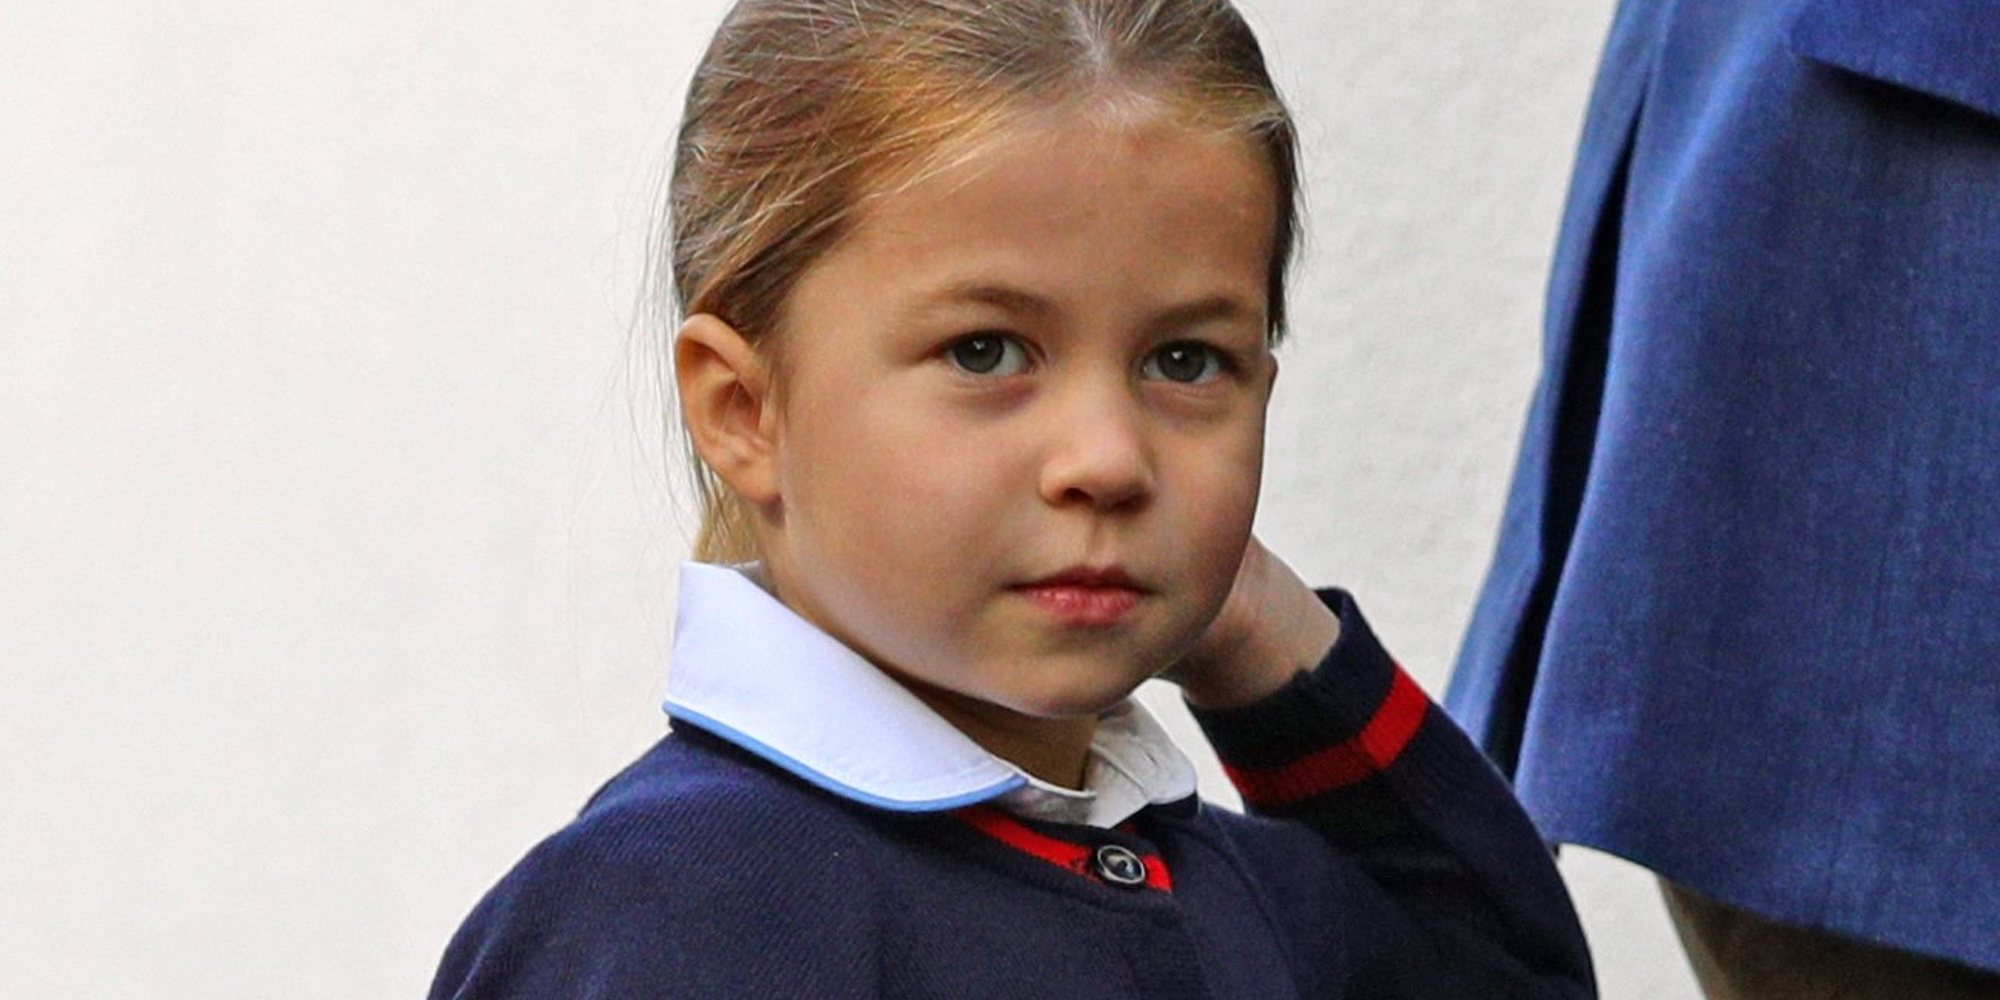 La Princesa Carlota de Cambridge celebra su sexto cumpleaños con una foto sonriente e inédita